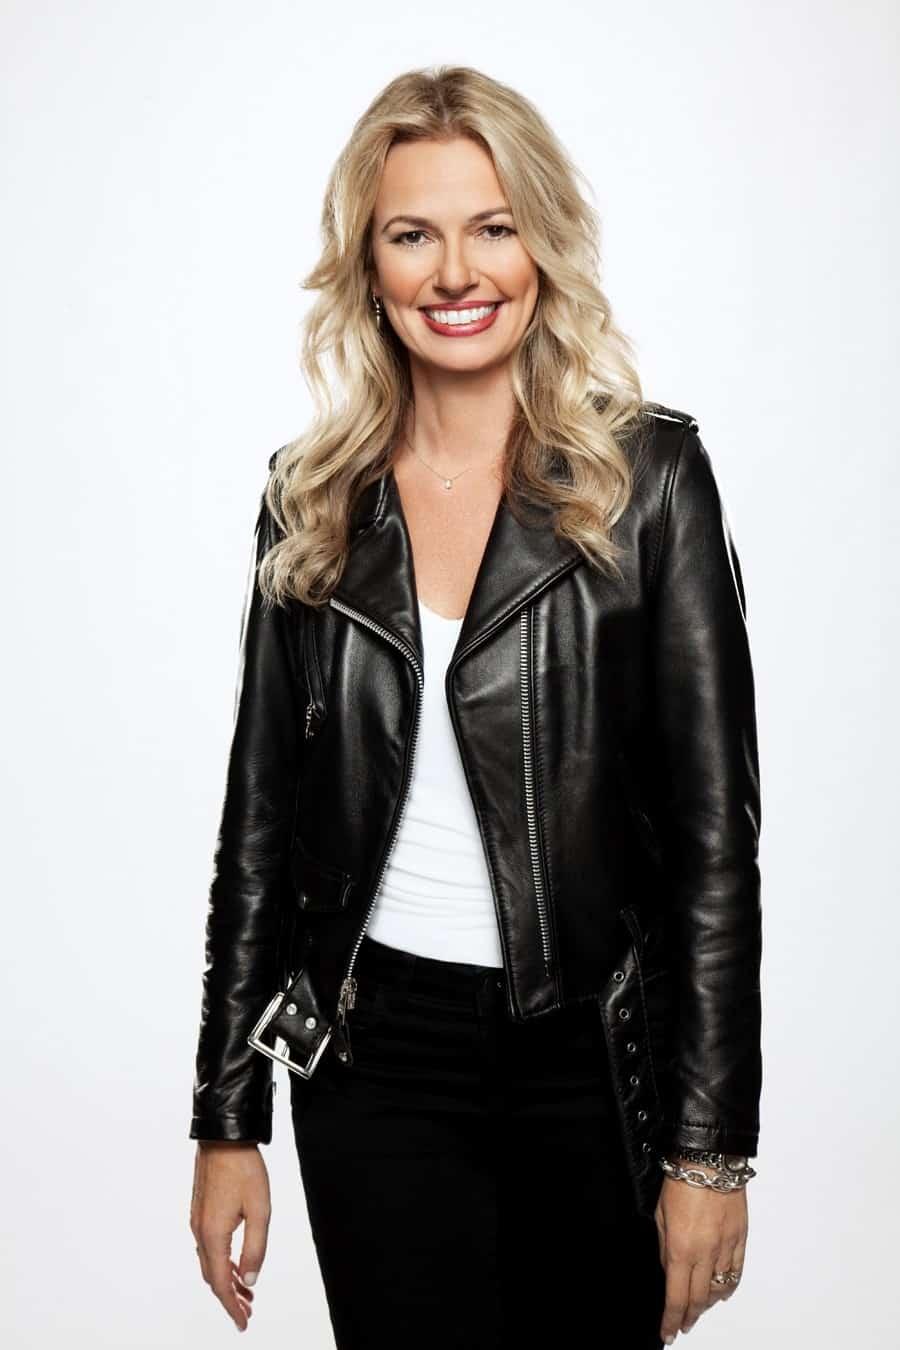 Cheryl Vitali, Global Brand President, Kiehl's Worldwide